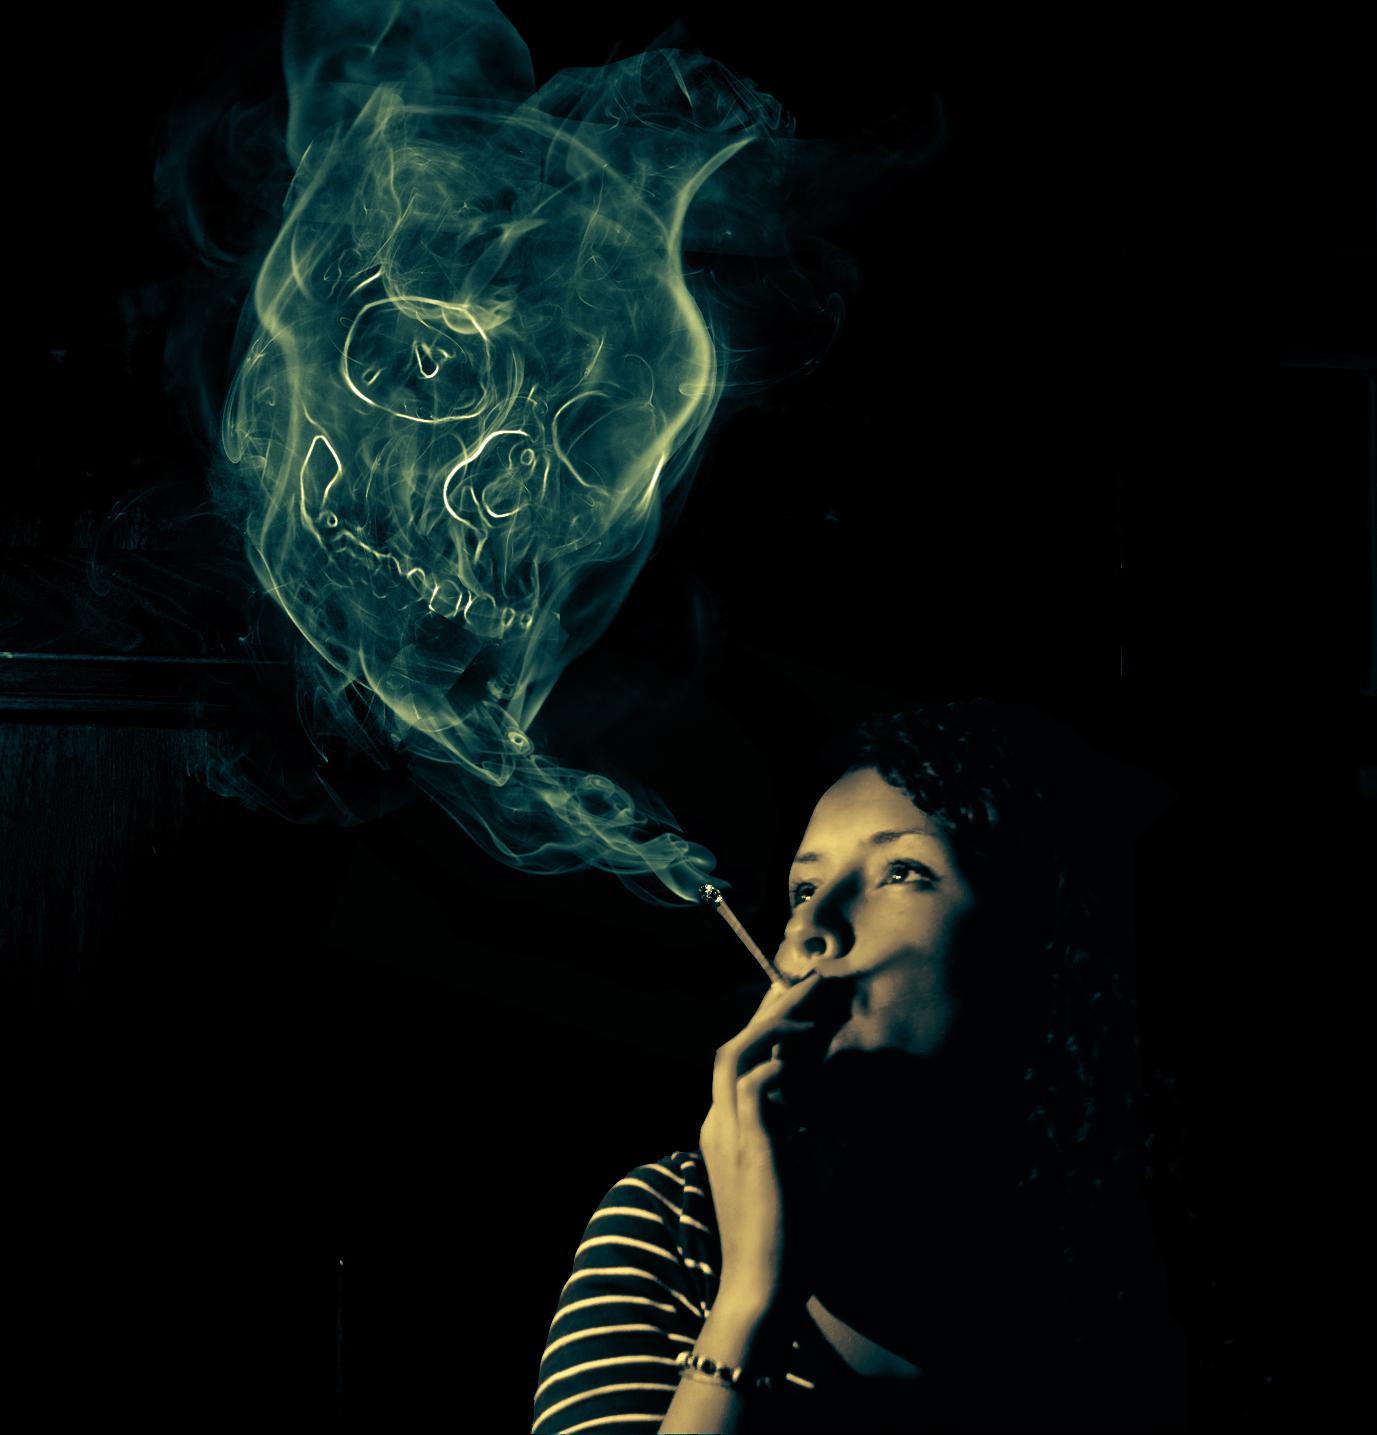 Skull of Smoke by ThingsOnVcrs on DeviantArt